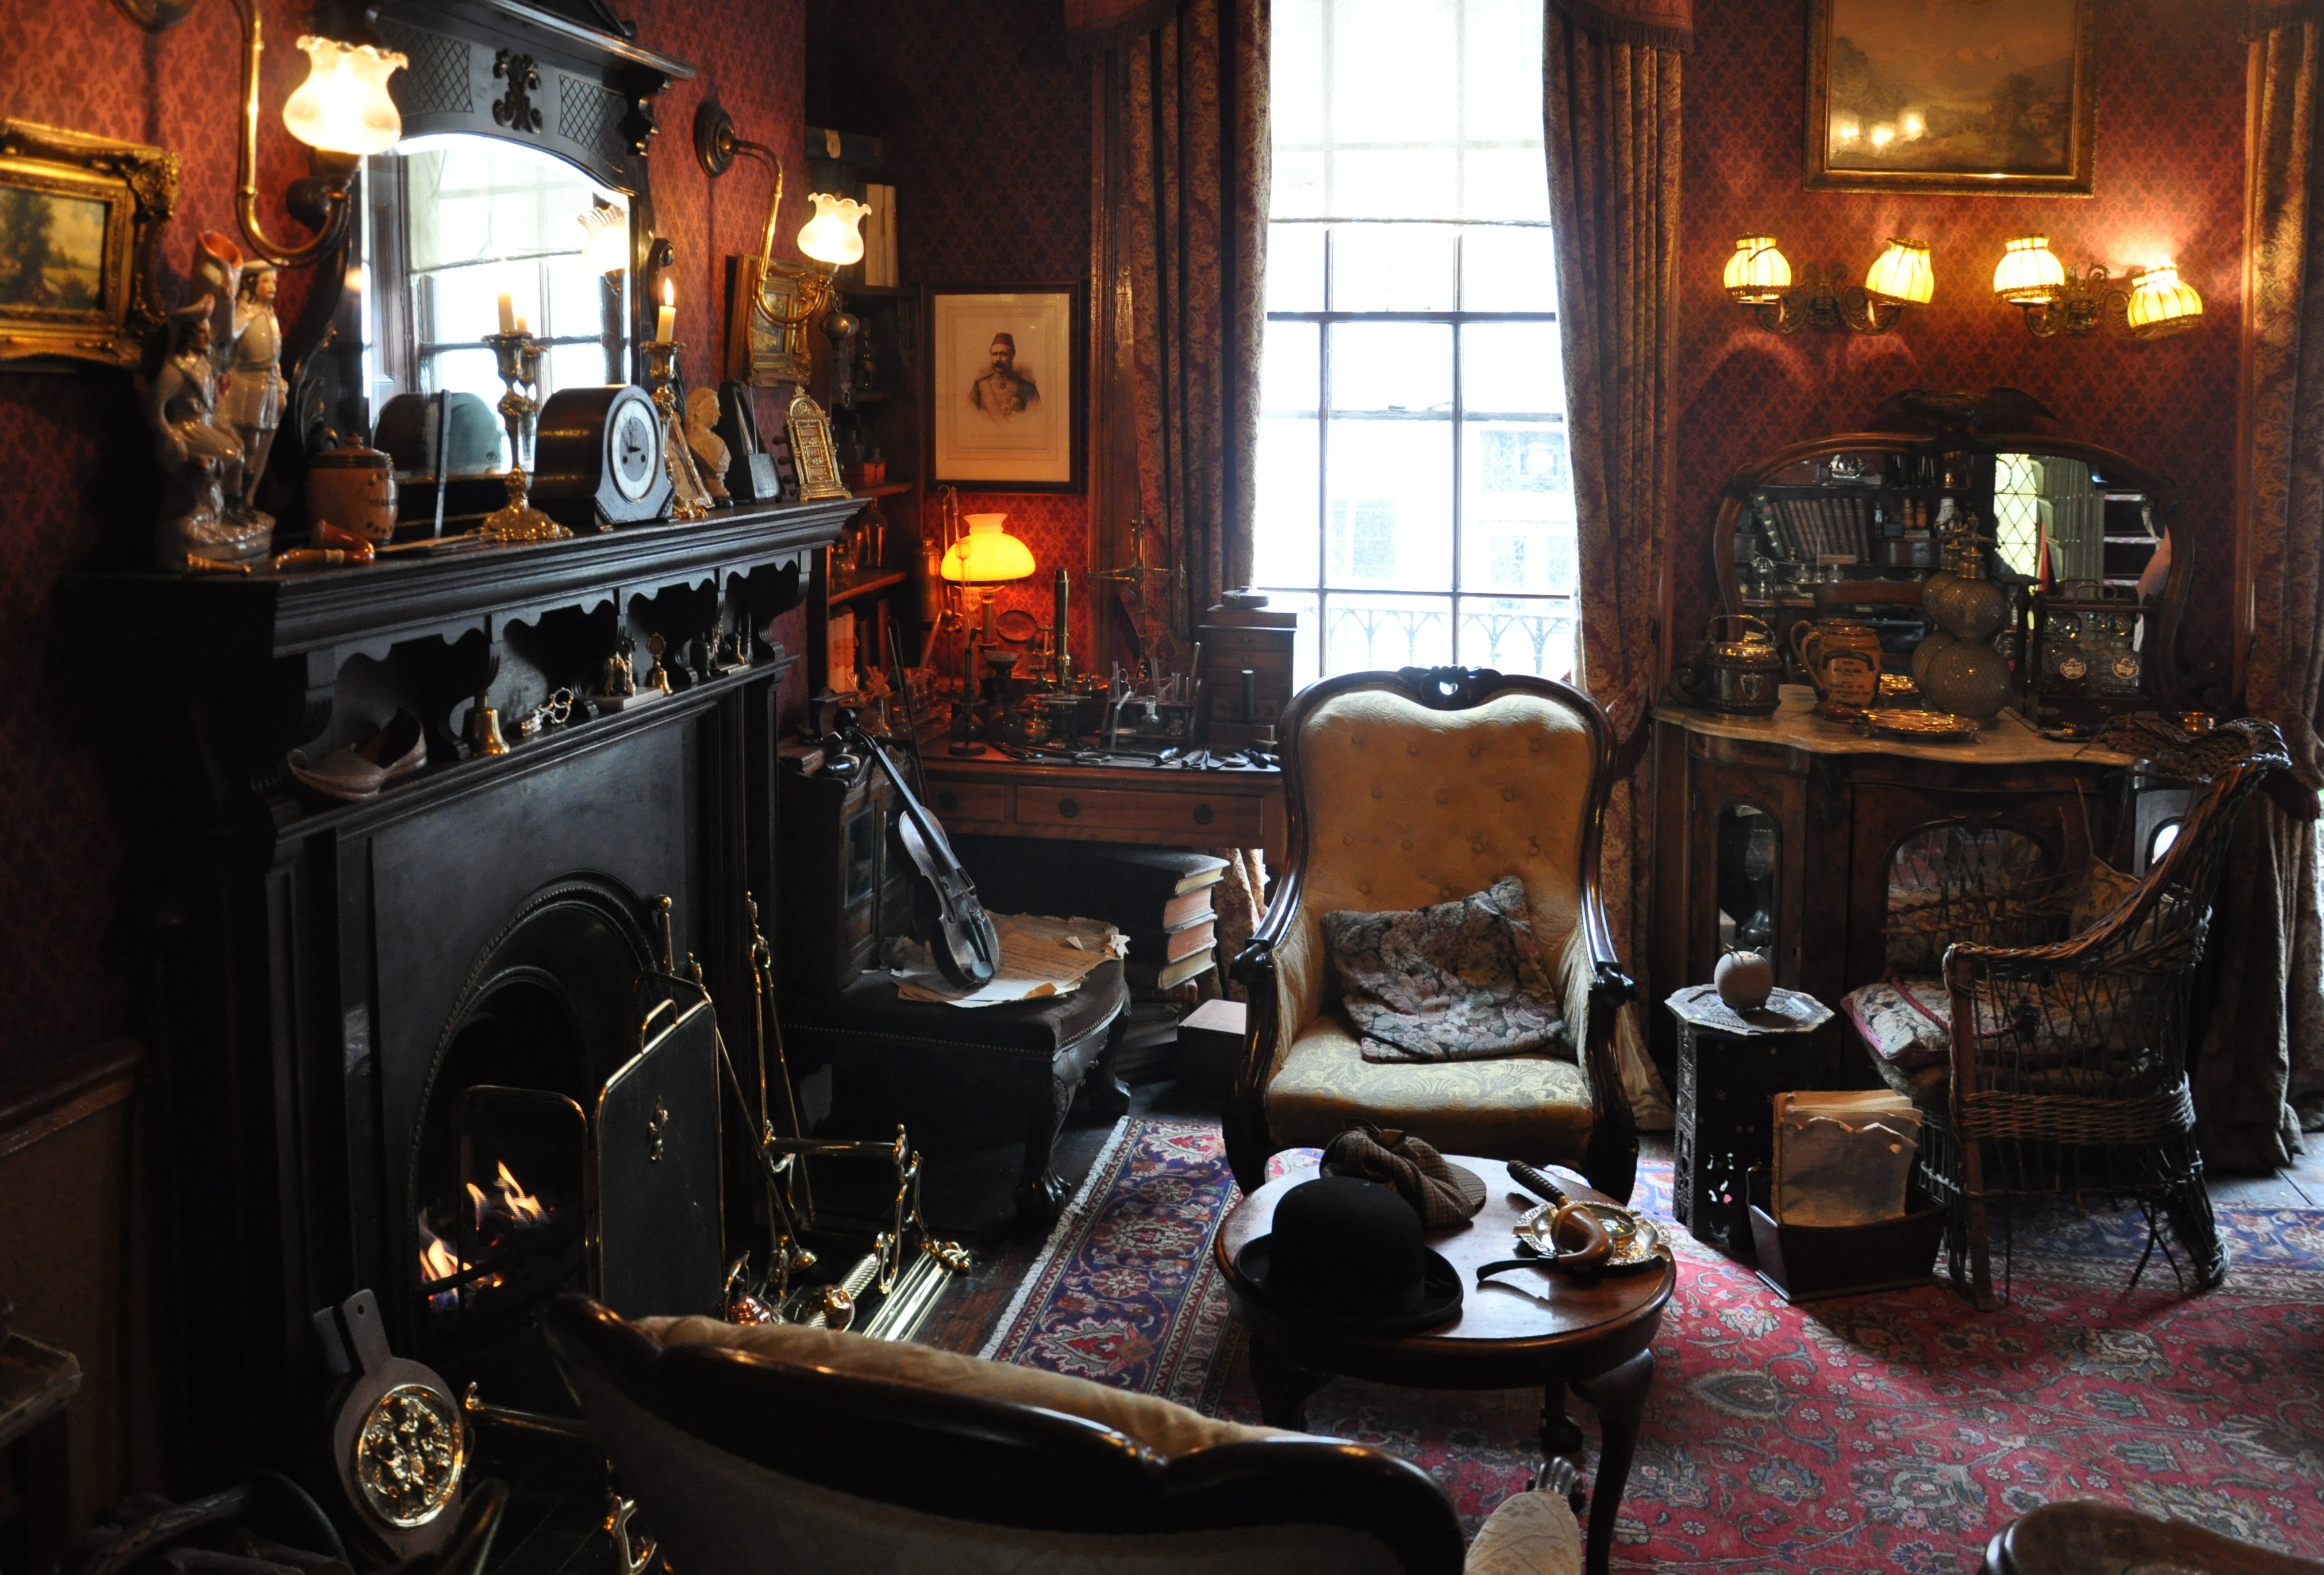 https://i0.wp.com/upload.wikimedia.org/wikipedia/commons/3/38/Sherlock_Holmes_Museum_001.jpg